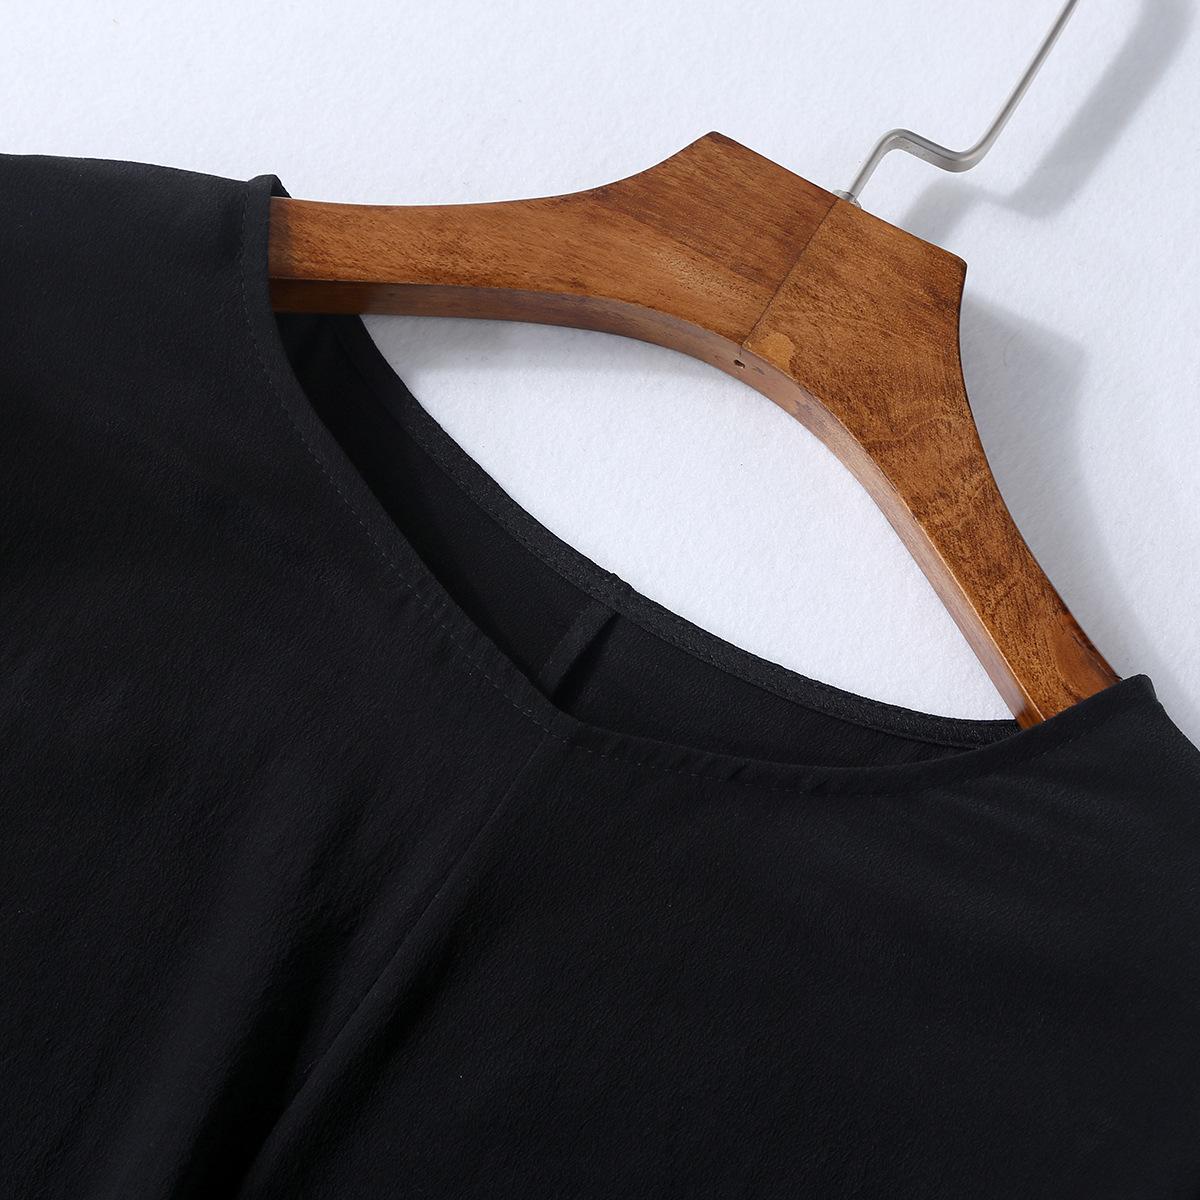 Robe femme en De la soie - Ref 3328990 Image 5